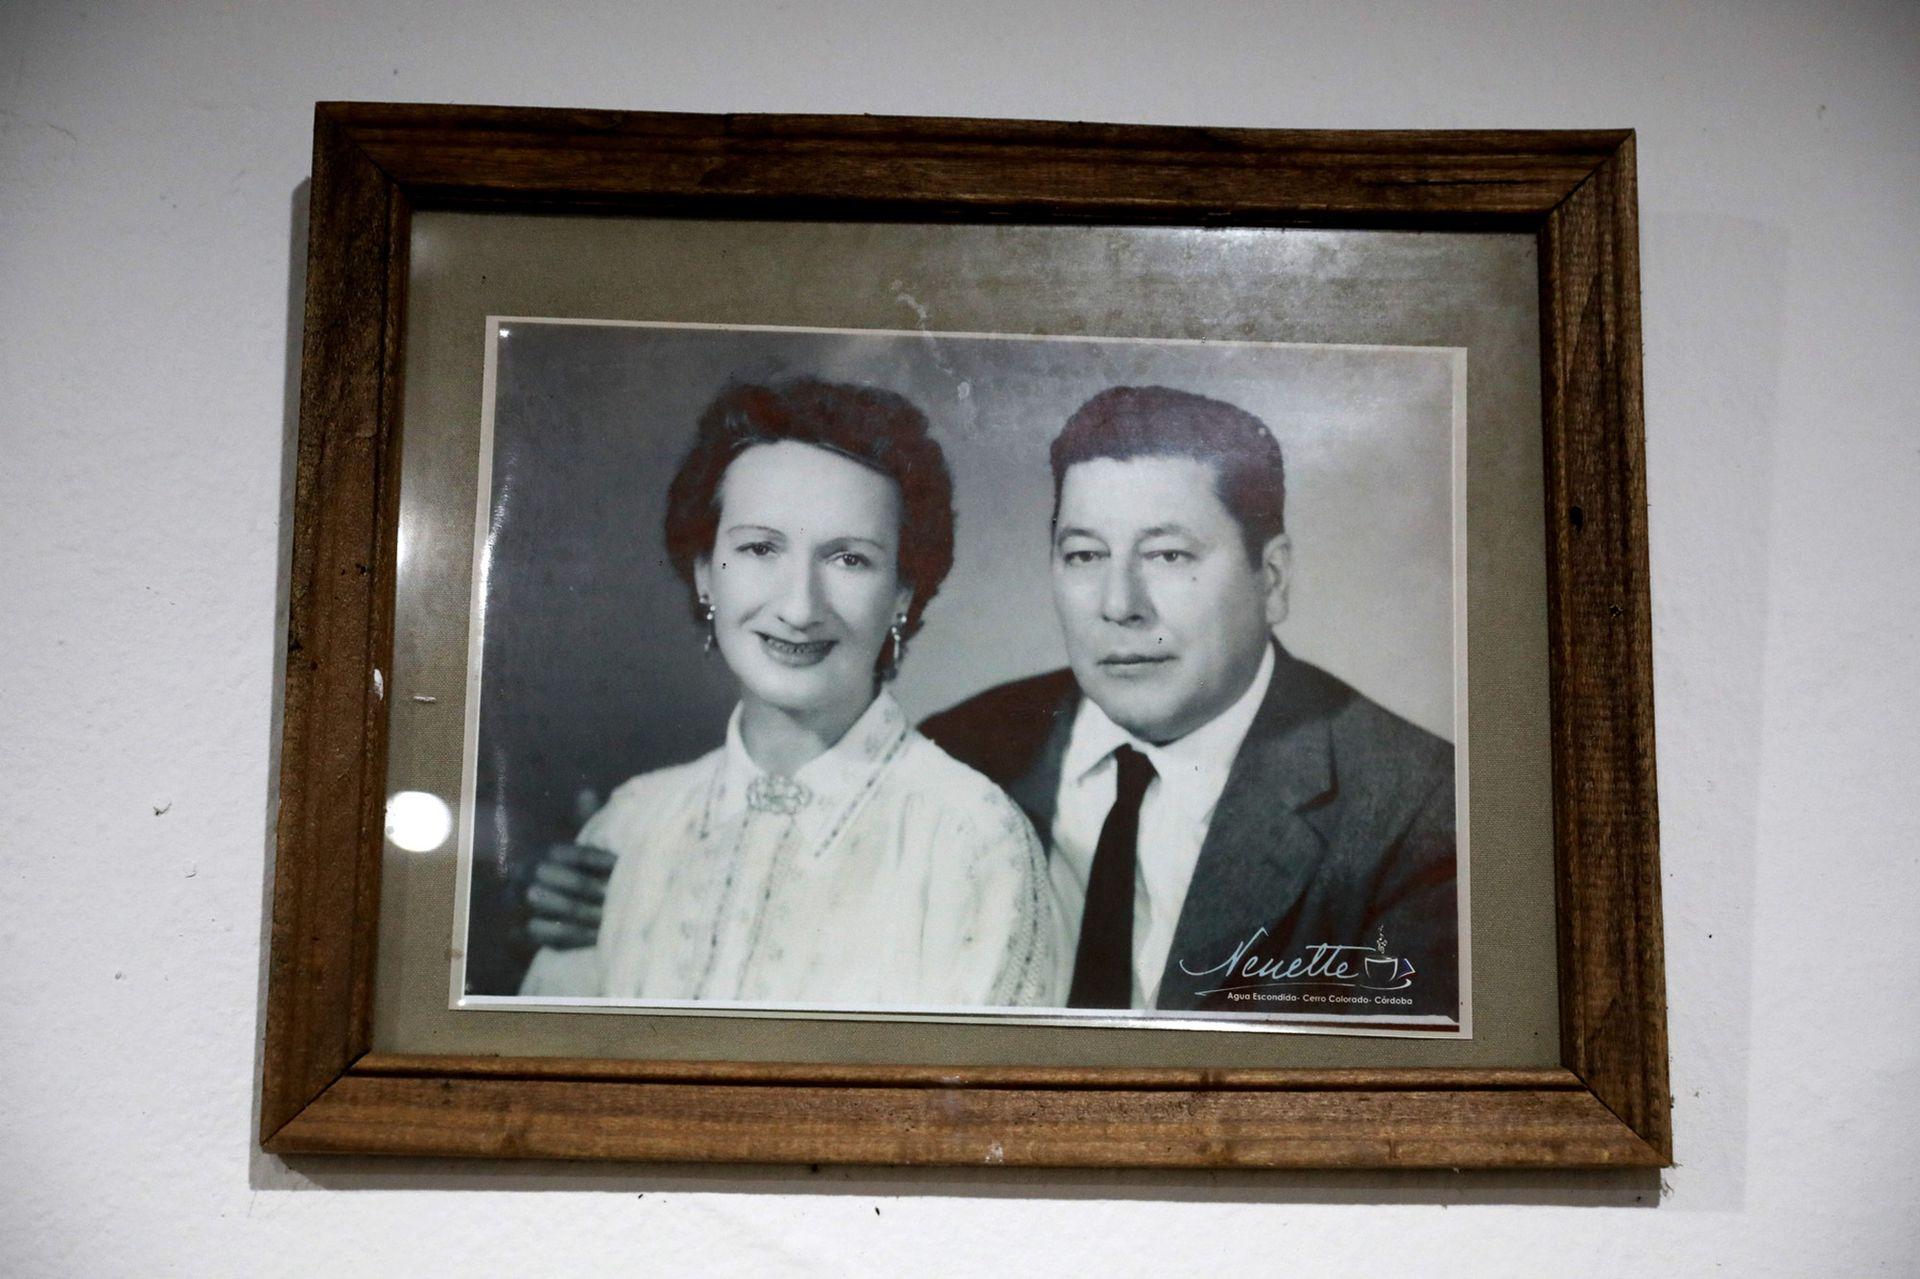 Retrato de Atahualpa Yupanqui con su esposa Antonietta Paule Pepin Fitzpatrick (conocida como Nenette)